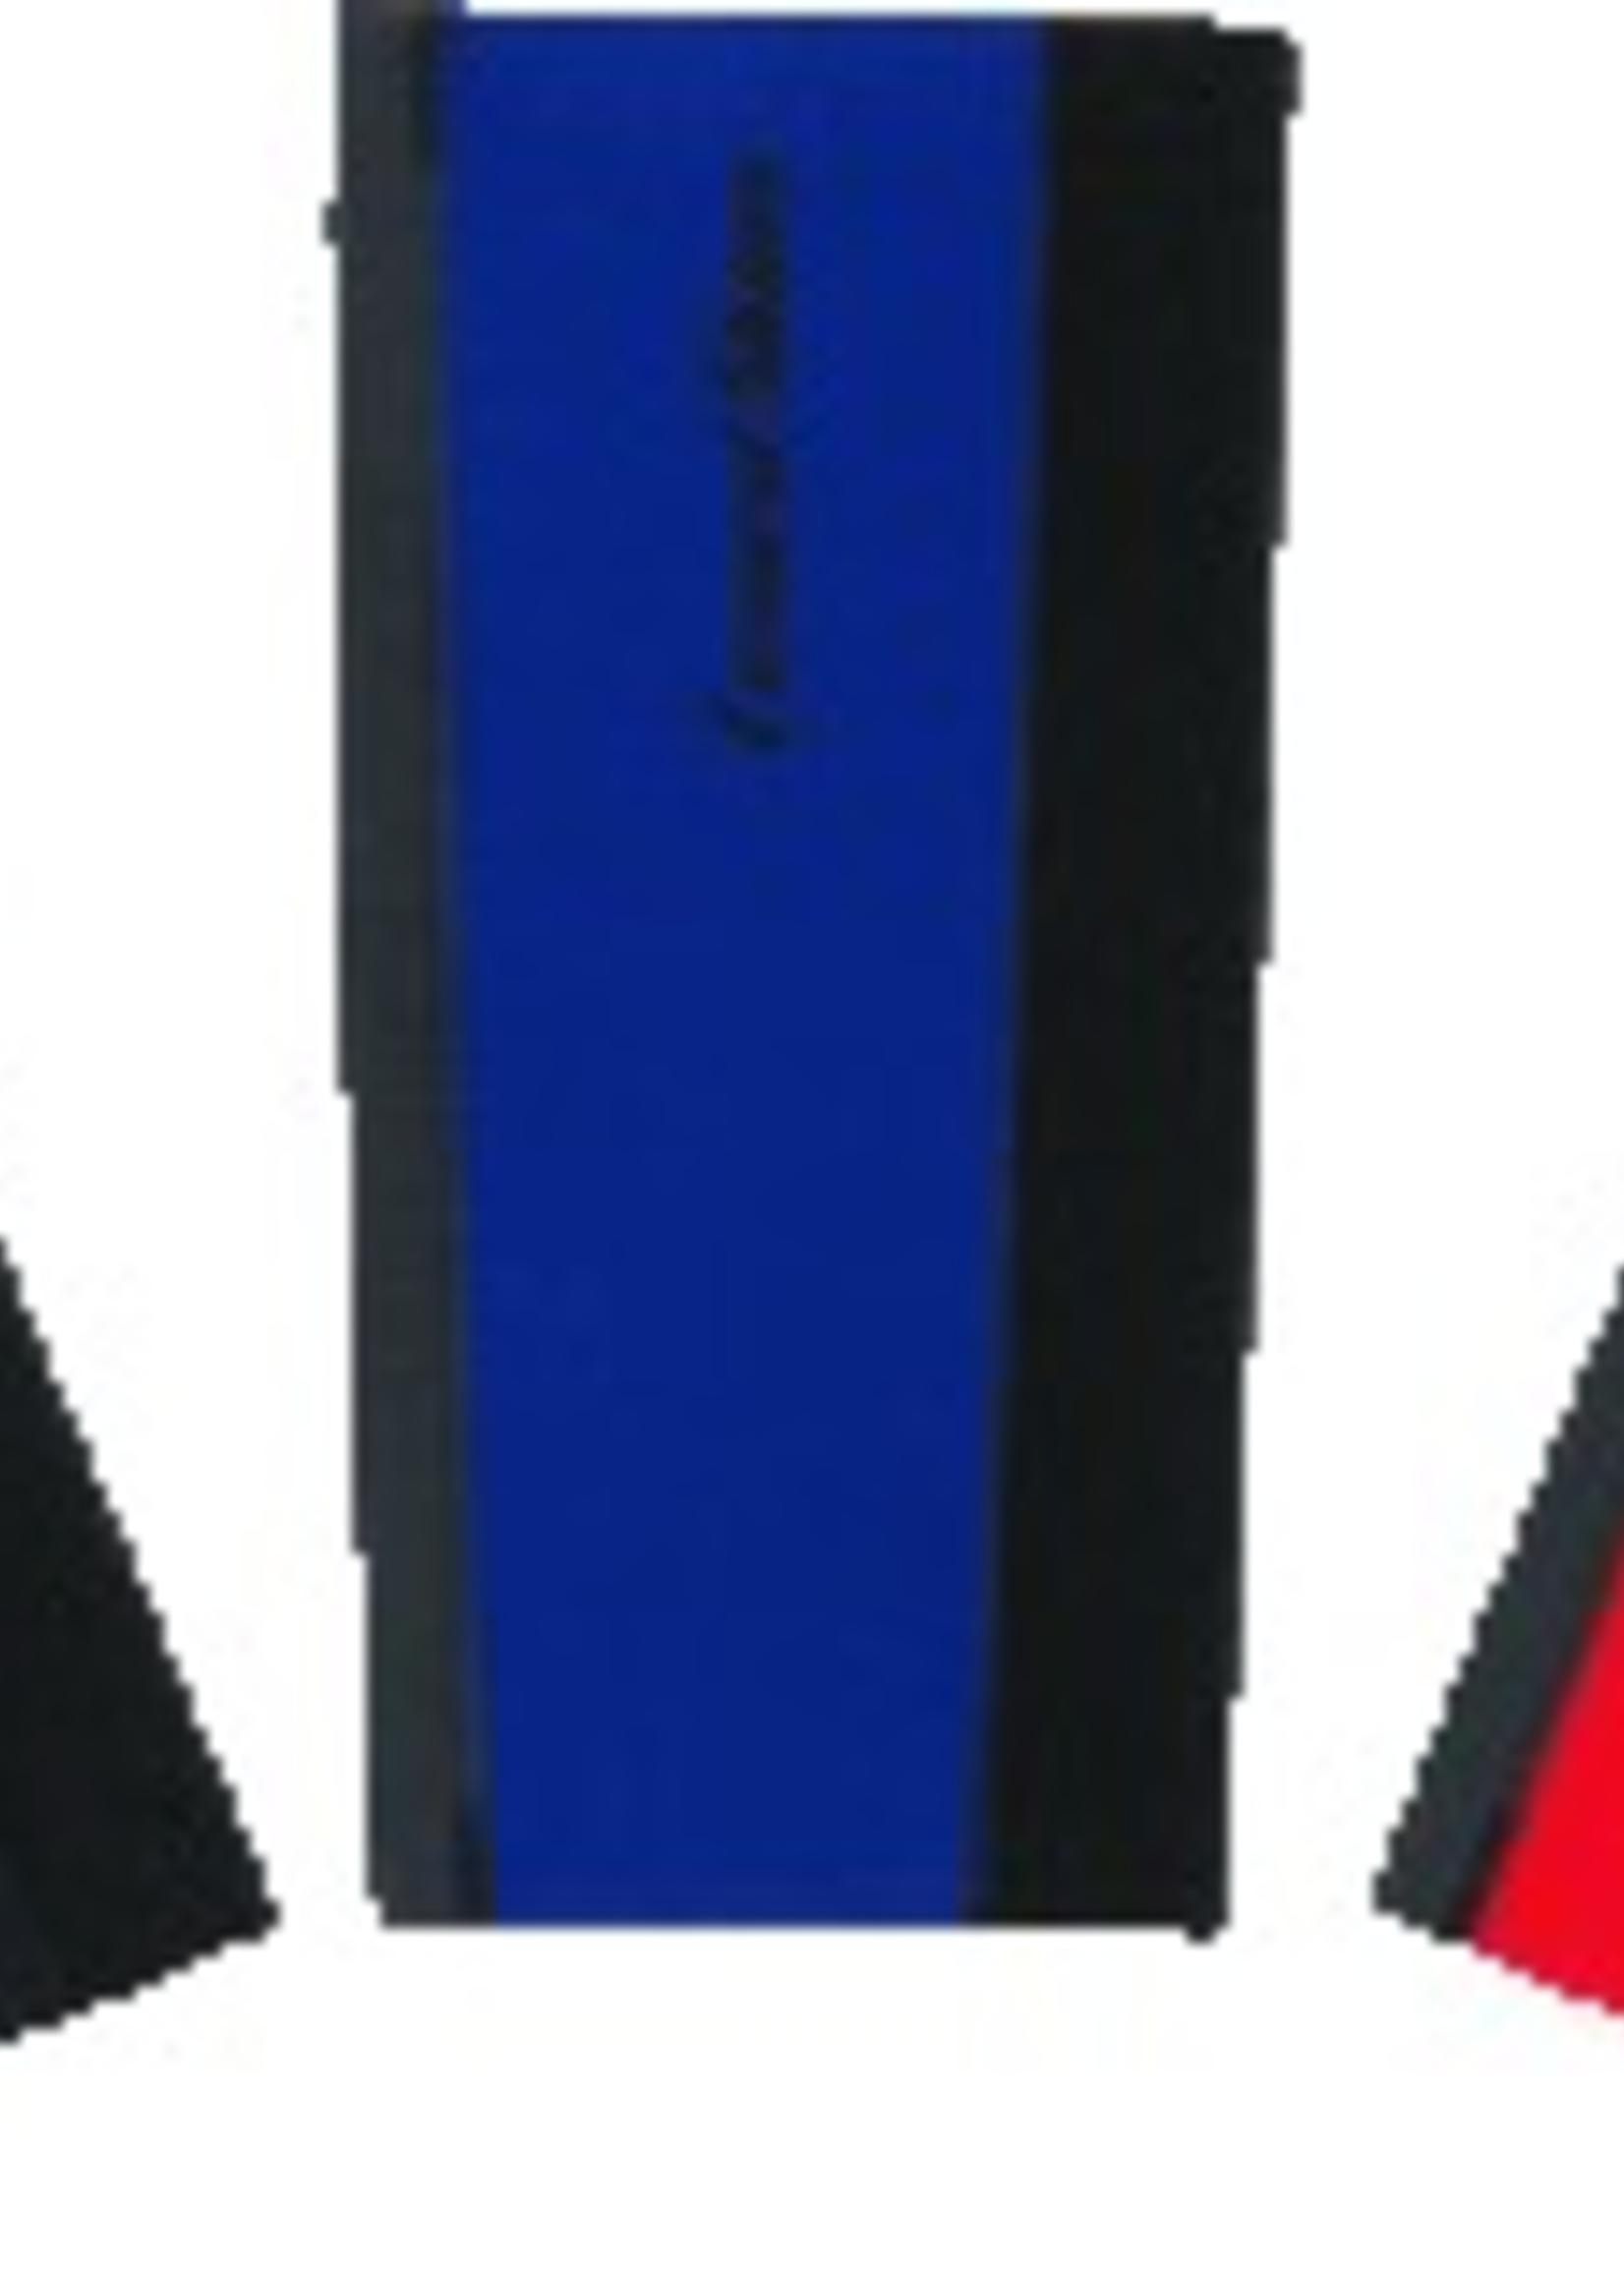 LIZARD SKIN - CHAIN GUARD - SMALL